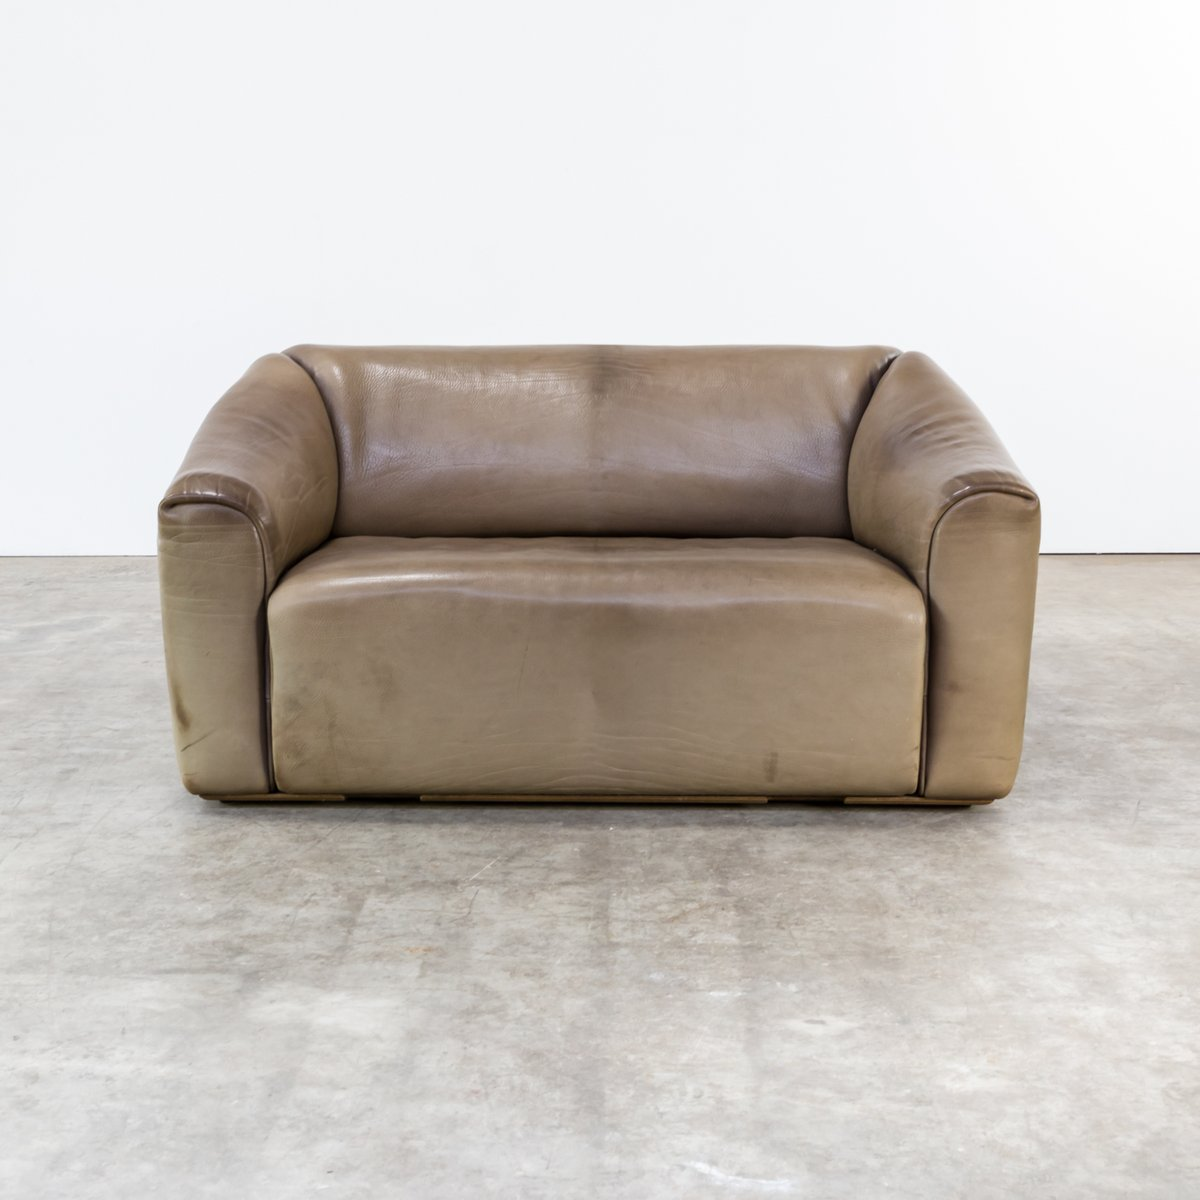 ds47 2 sitzer ledersofa von de sede 1960er bei pamono kaufen. Black Bedroom Furniture Sets. Home Design Ideas